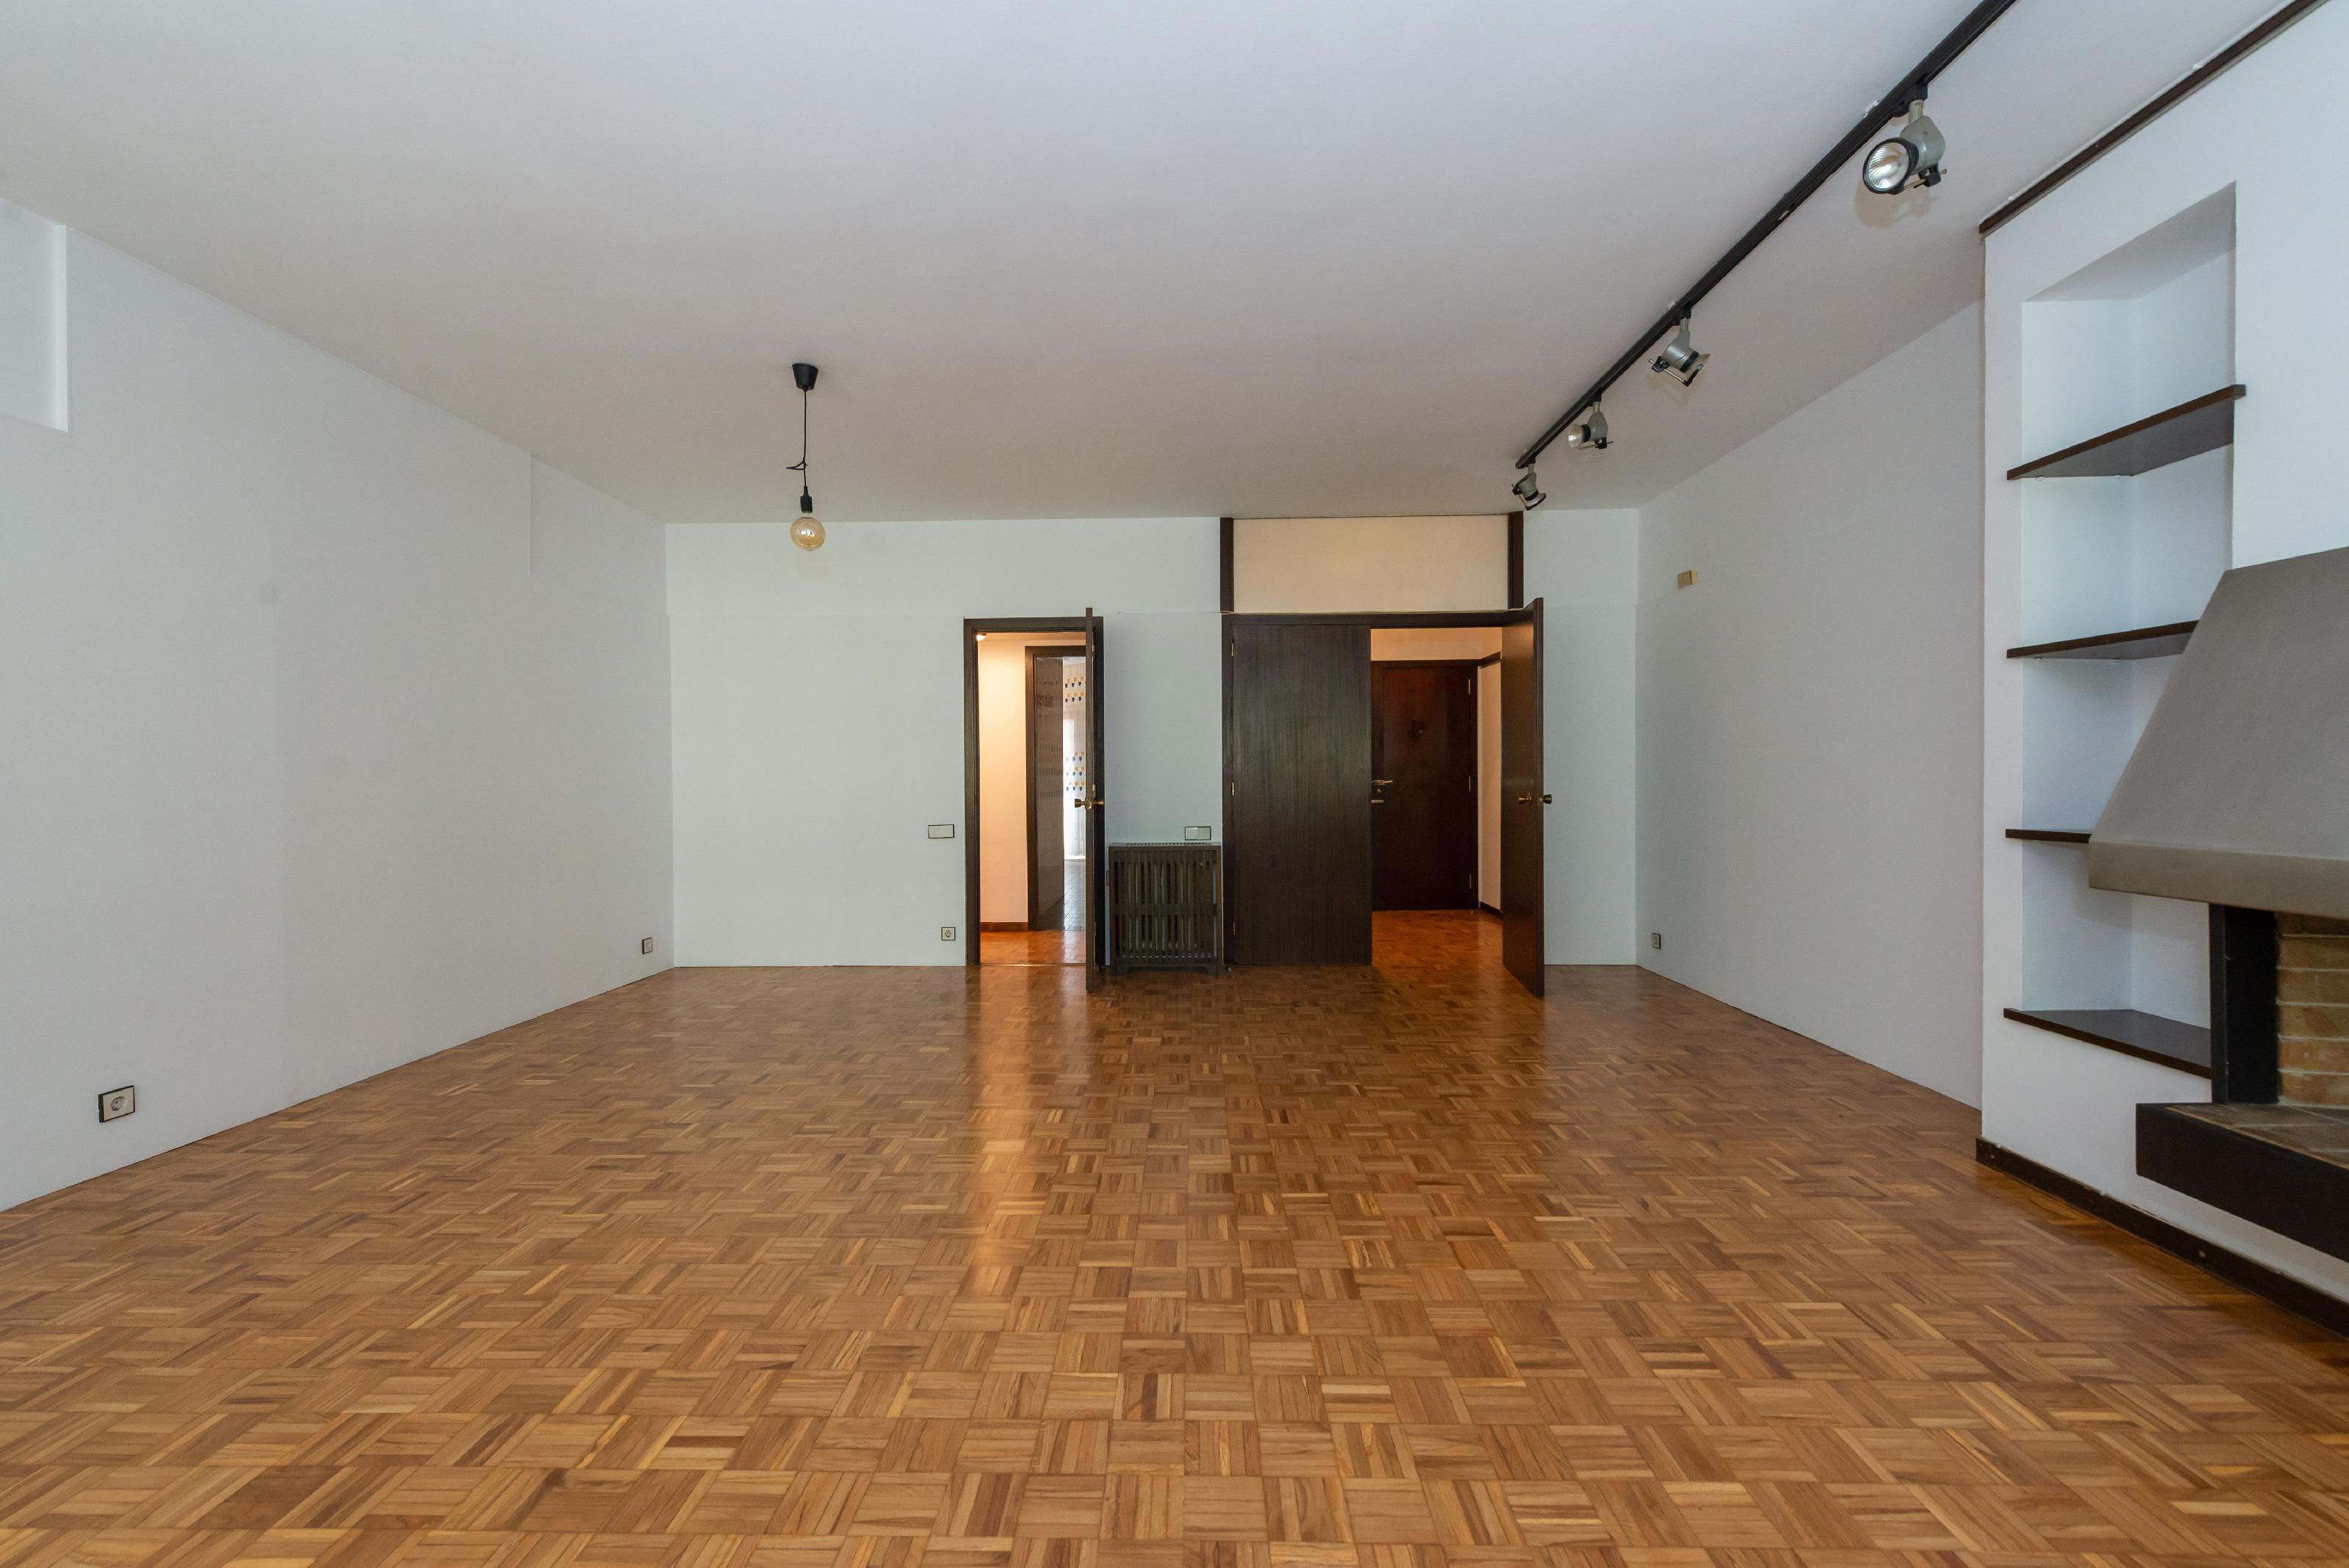 253470 Flat for sale in Sarrià-Sant Gervasi, El Putxet and Farró 13